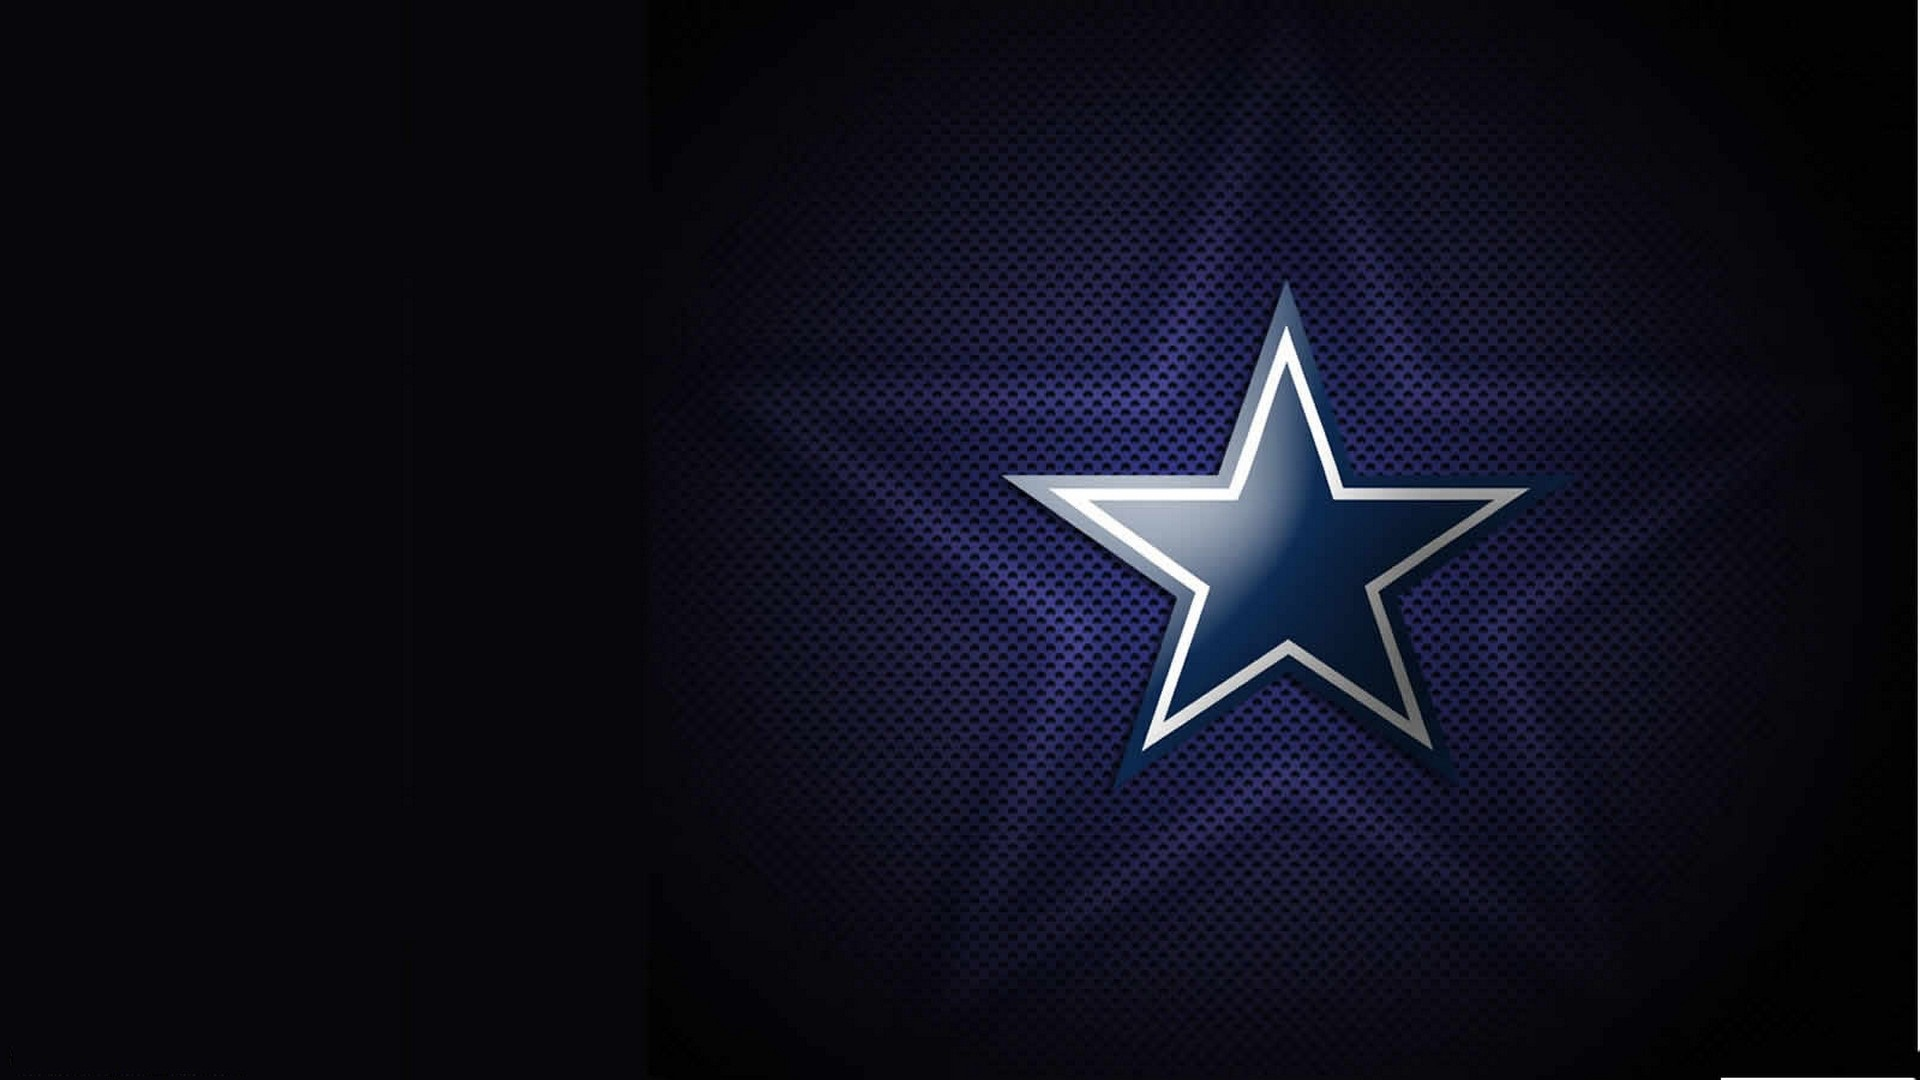 Dallas Cowboys HD Wallpapers 2020 NFL Football Wallpapers 1920x1080